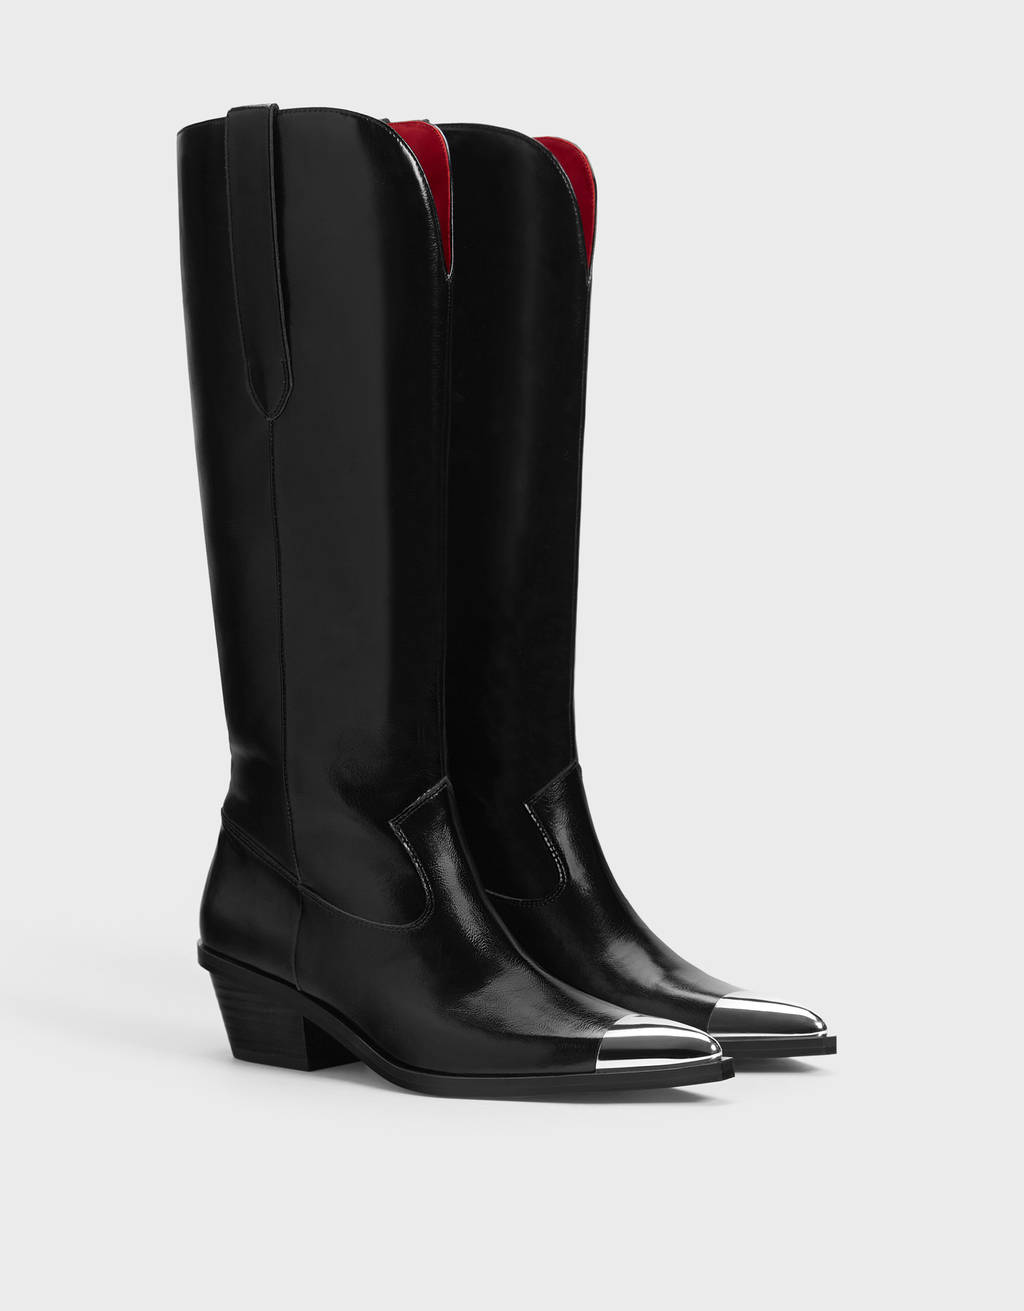 Cowboy boots with metallic toecaps